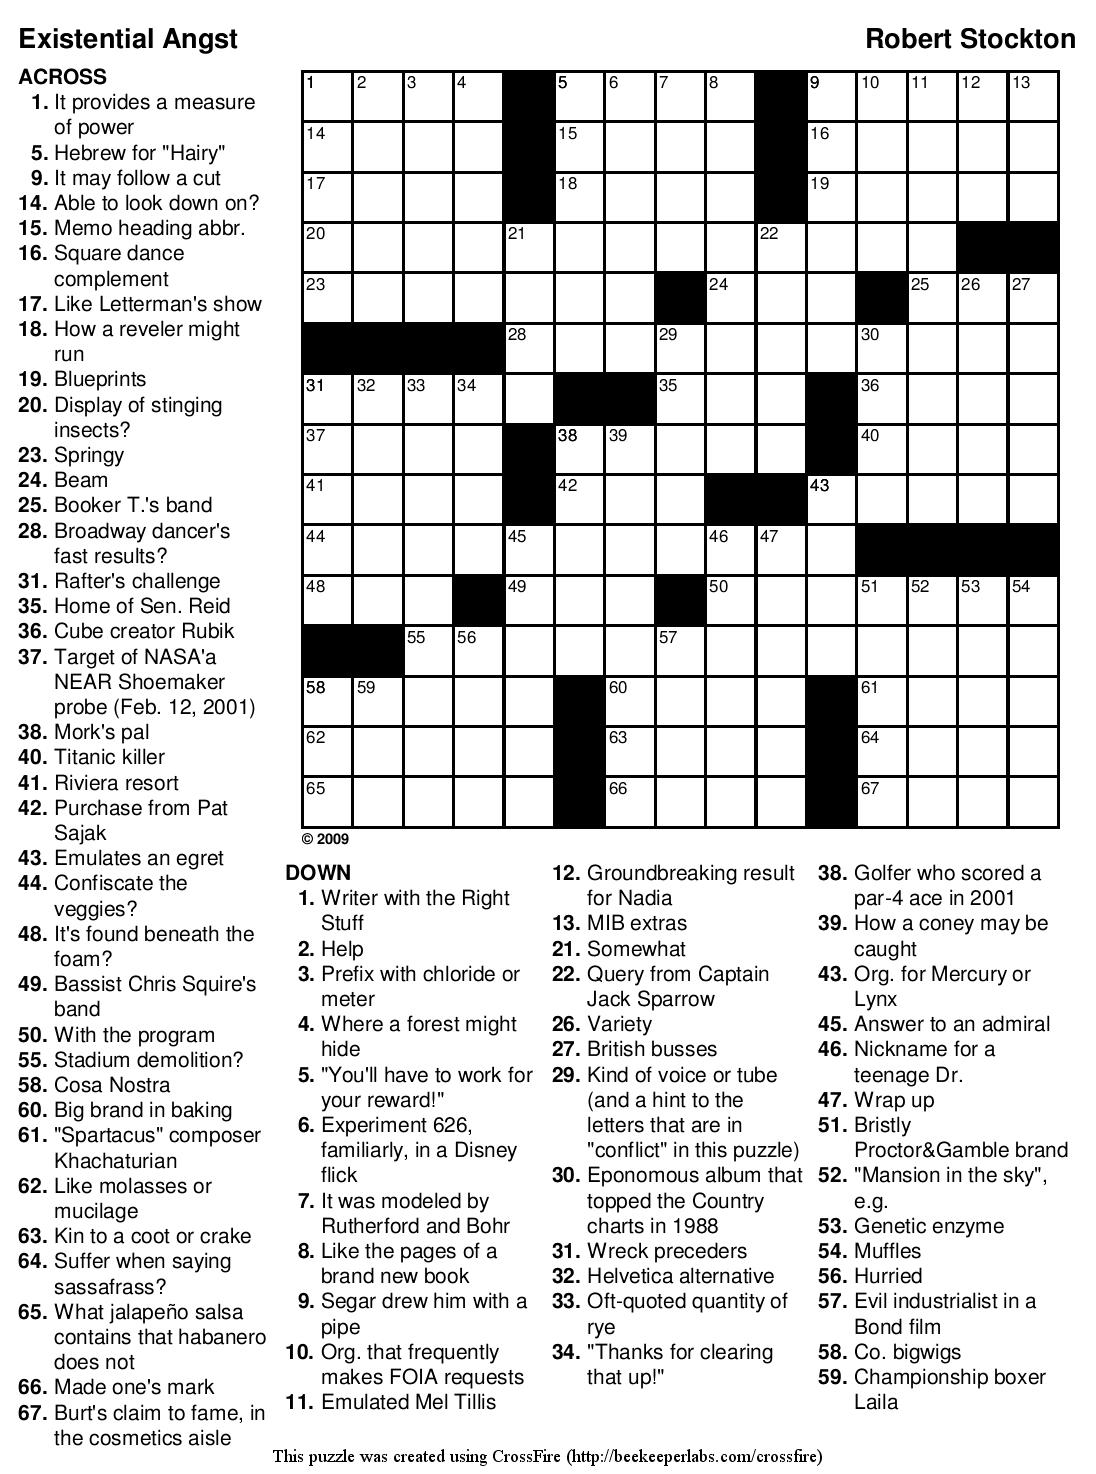 free arrow word puzzles online beekeeper crosswords blog archive puzzle 97 online arrow word free puzzles